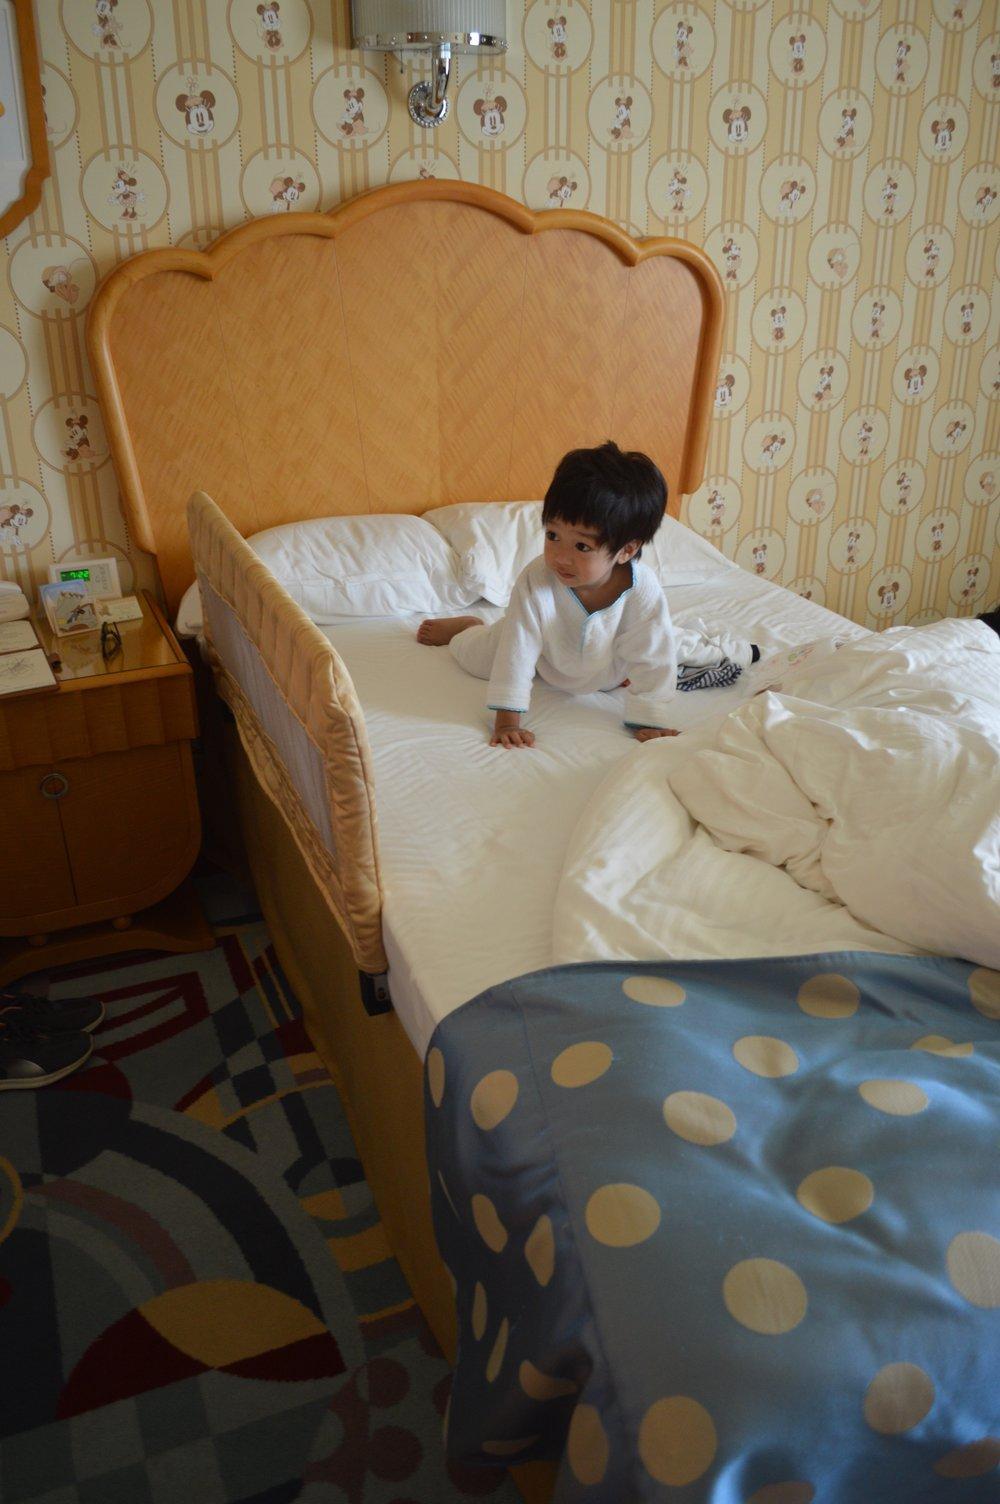 Baby Haku wakes up from his slumber in Disney Ambassador Hotel